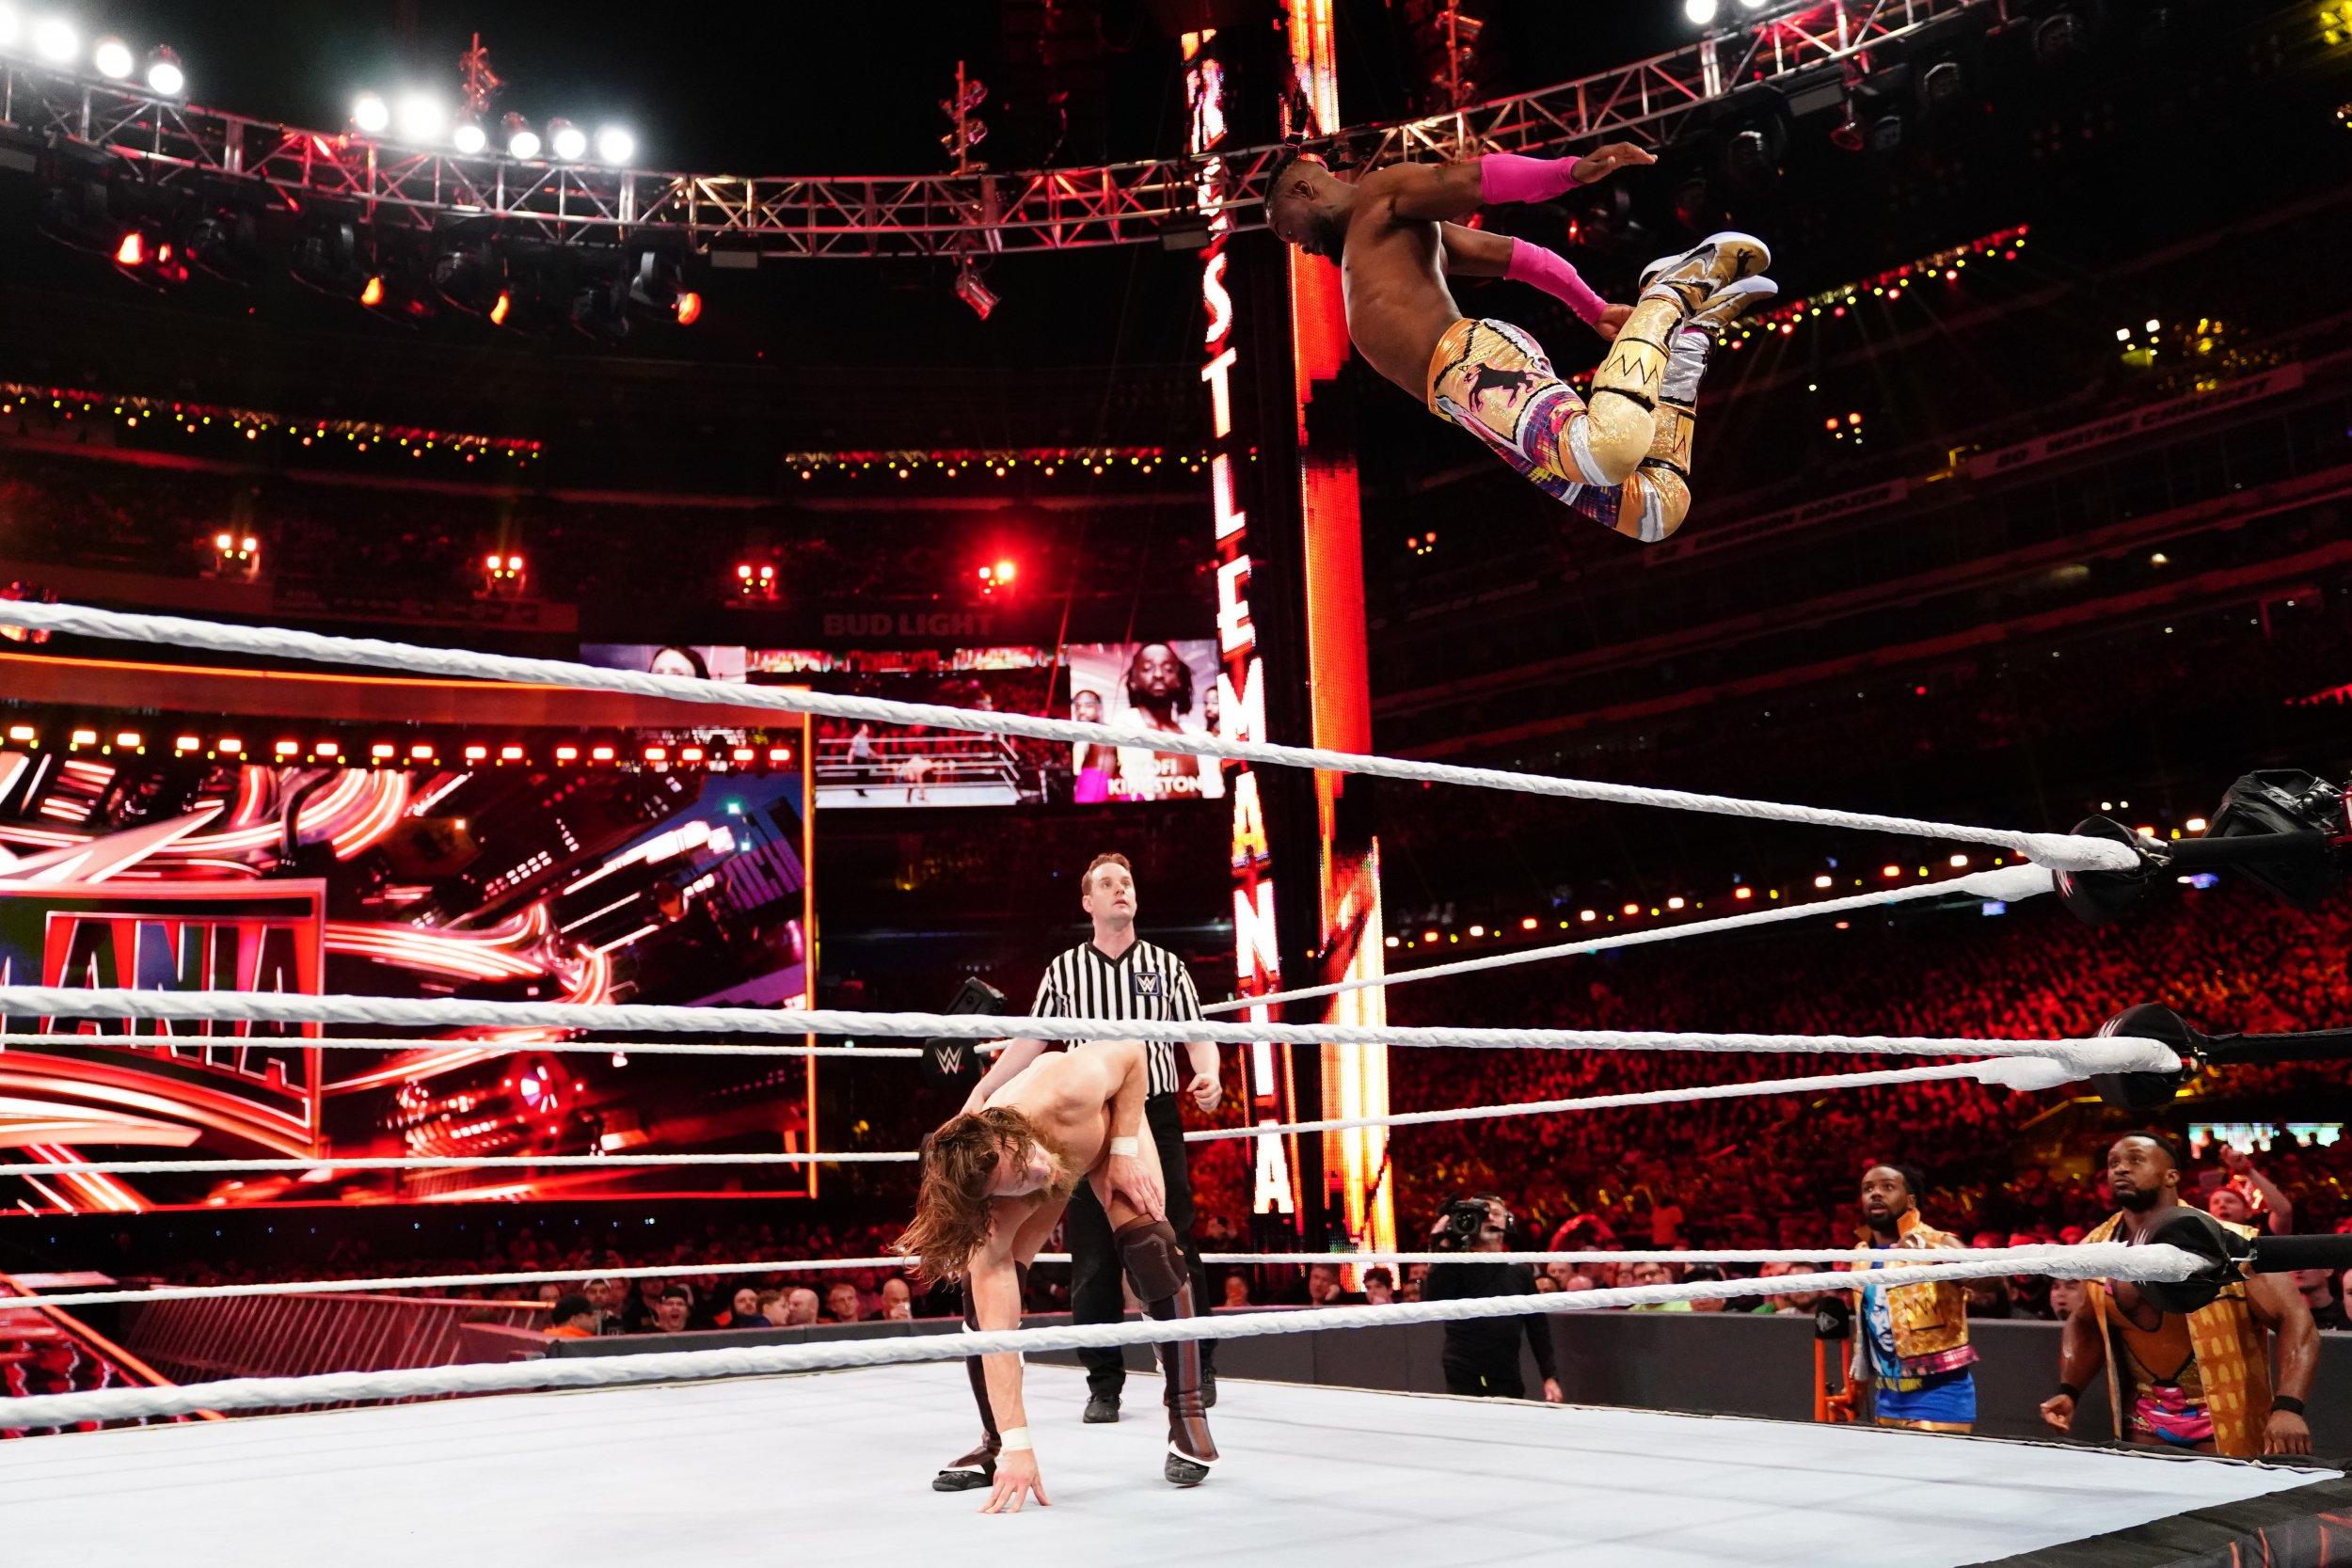 kofi kingston daniel bryan wrestlemania 35 match